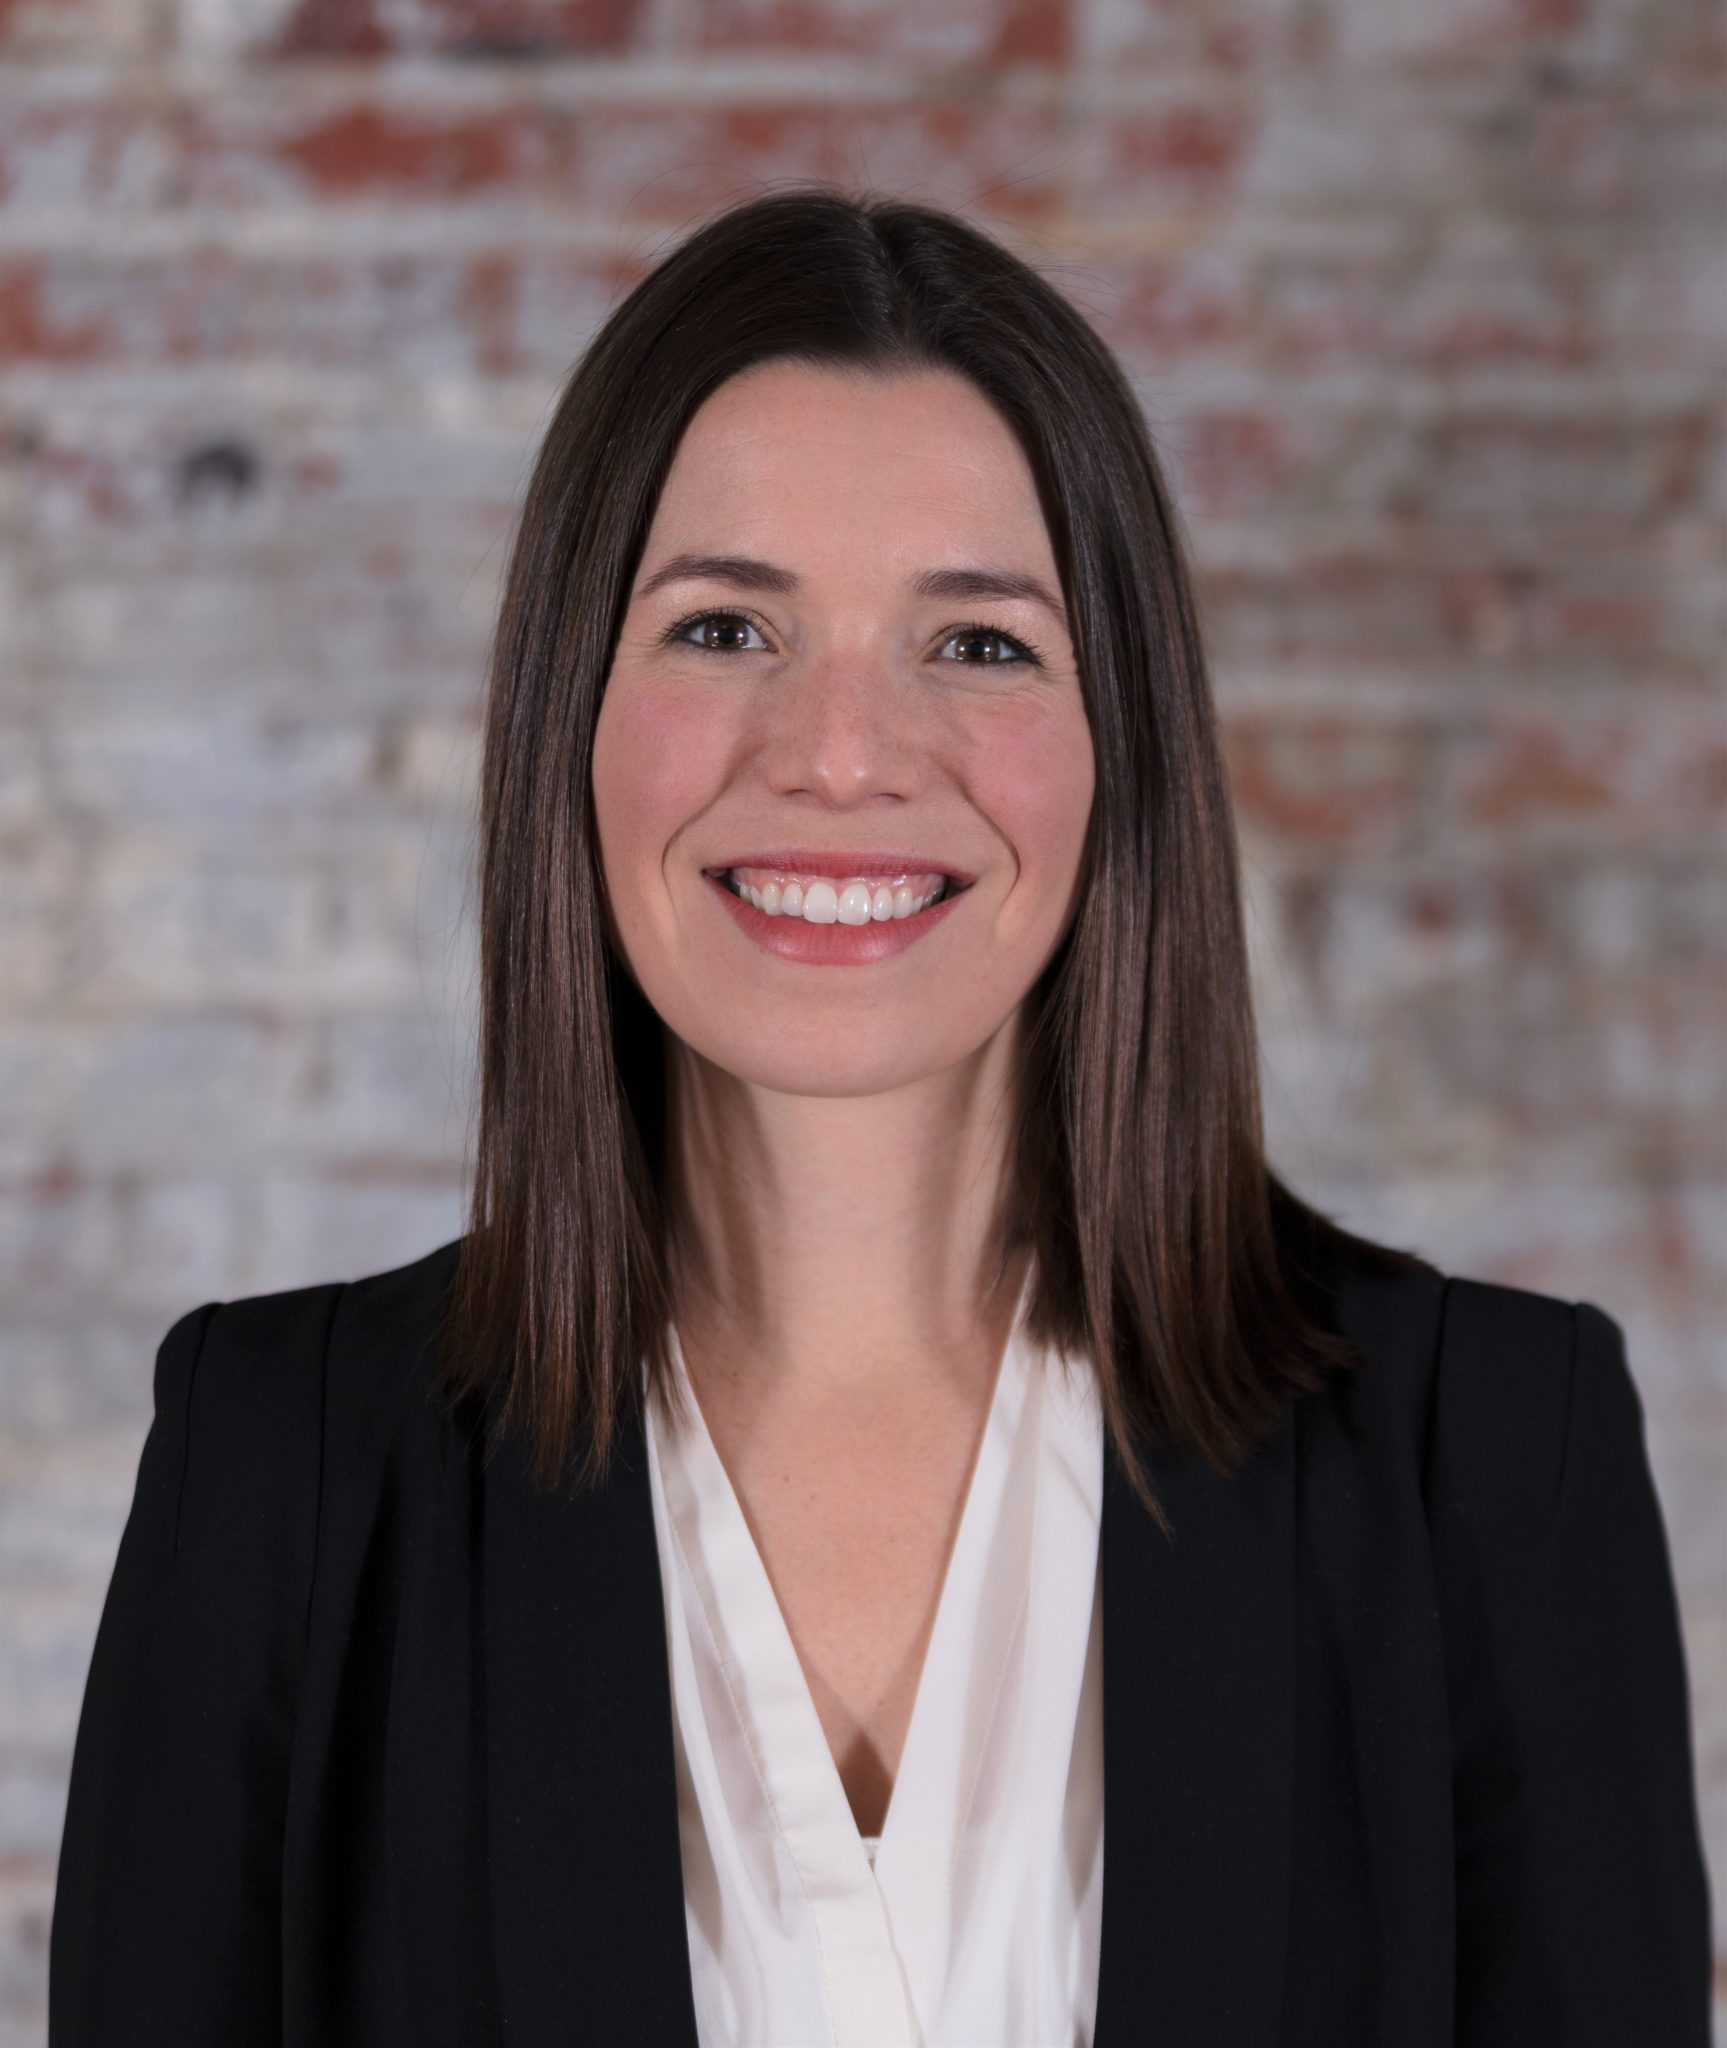 Alexandra Wieland